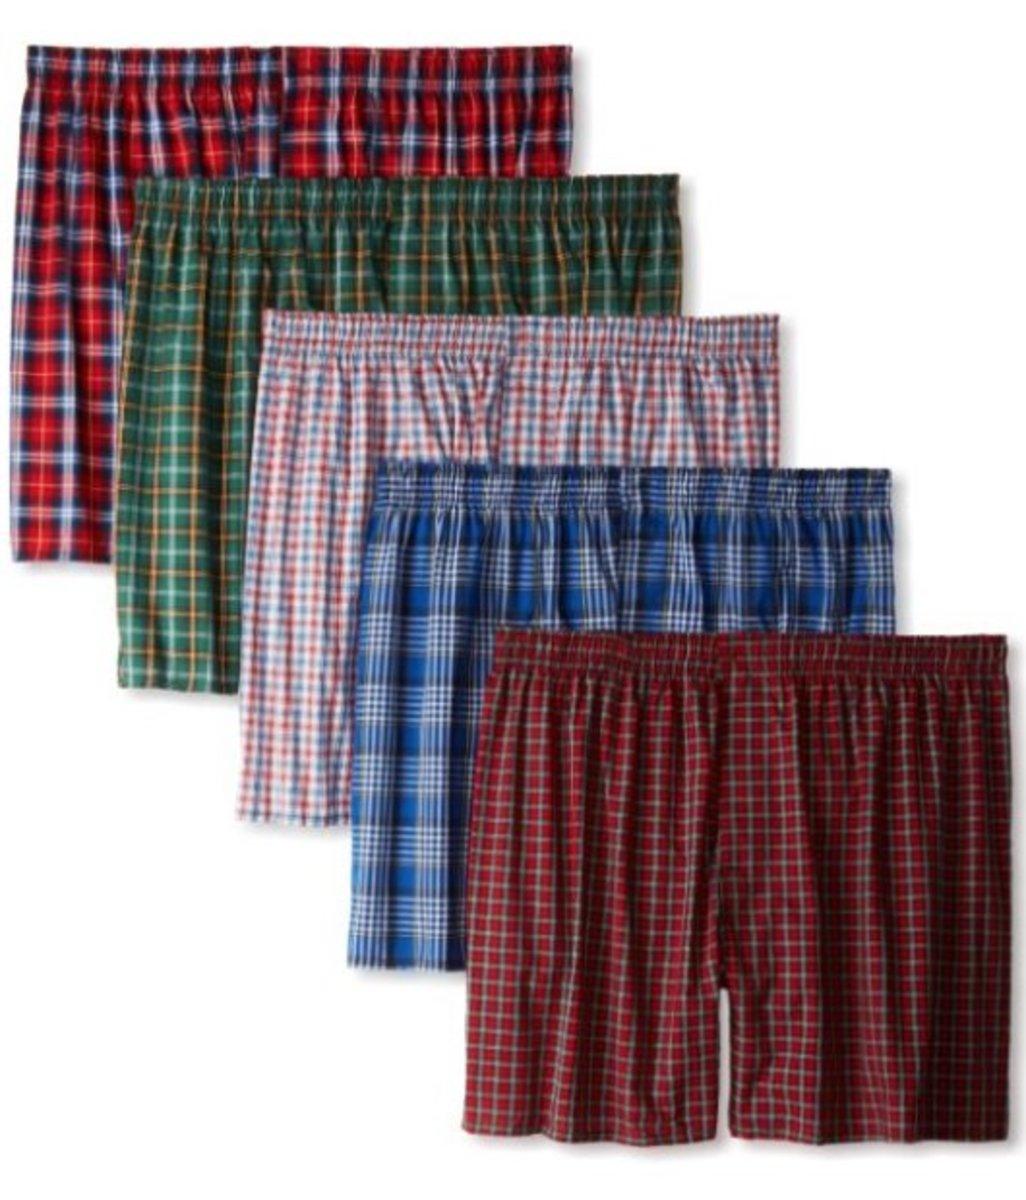 4230107addb0 Which Type of Men's Underwear Should I Wear | Bellatory